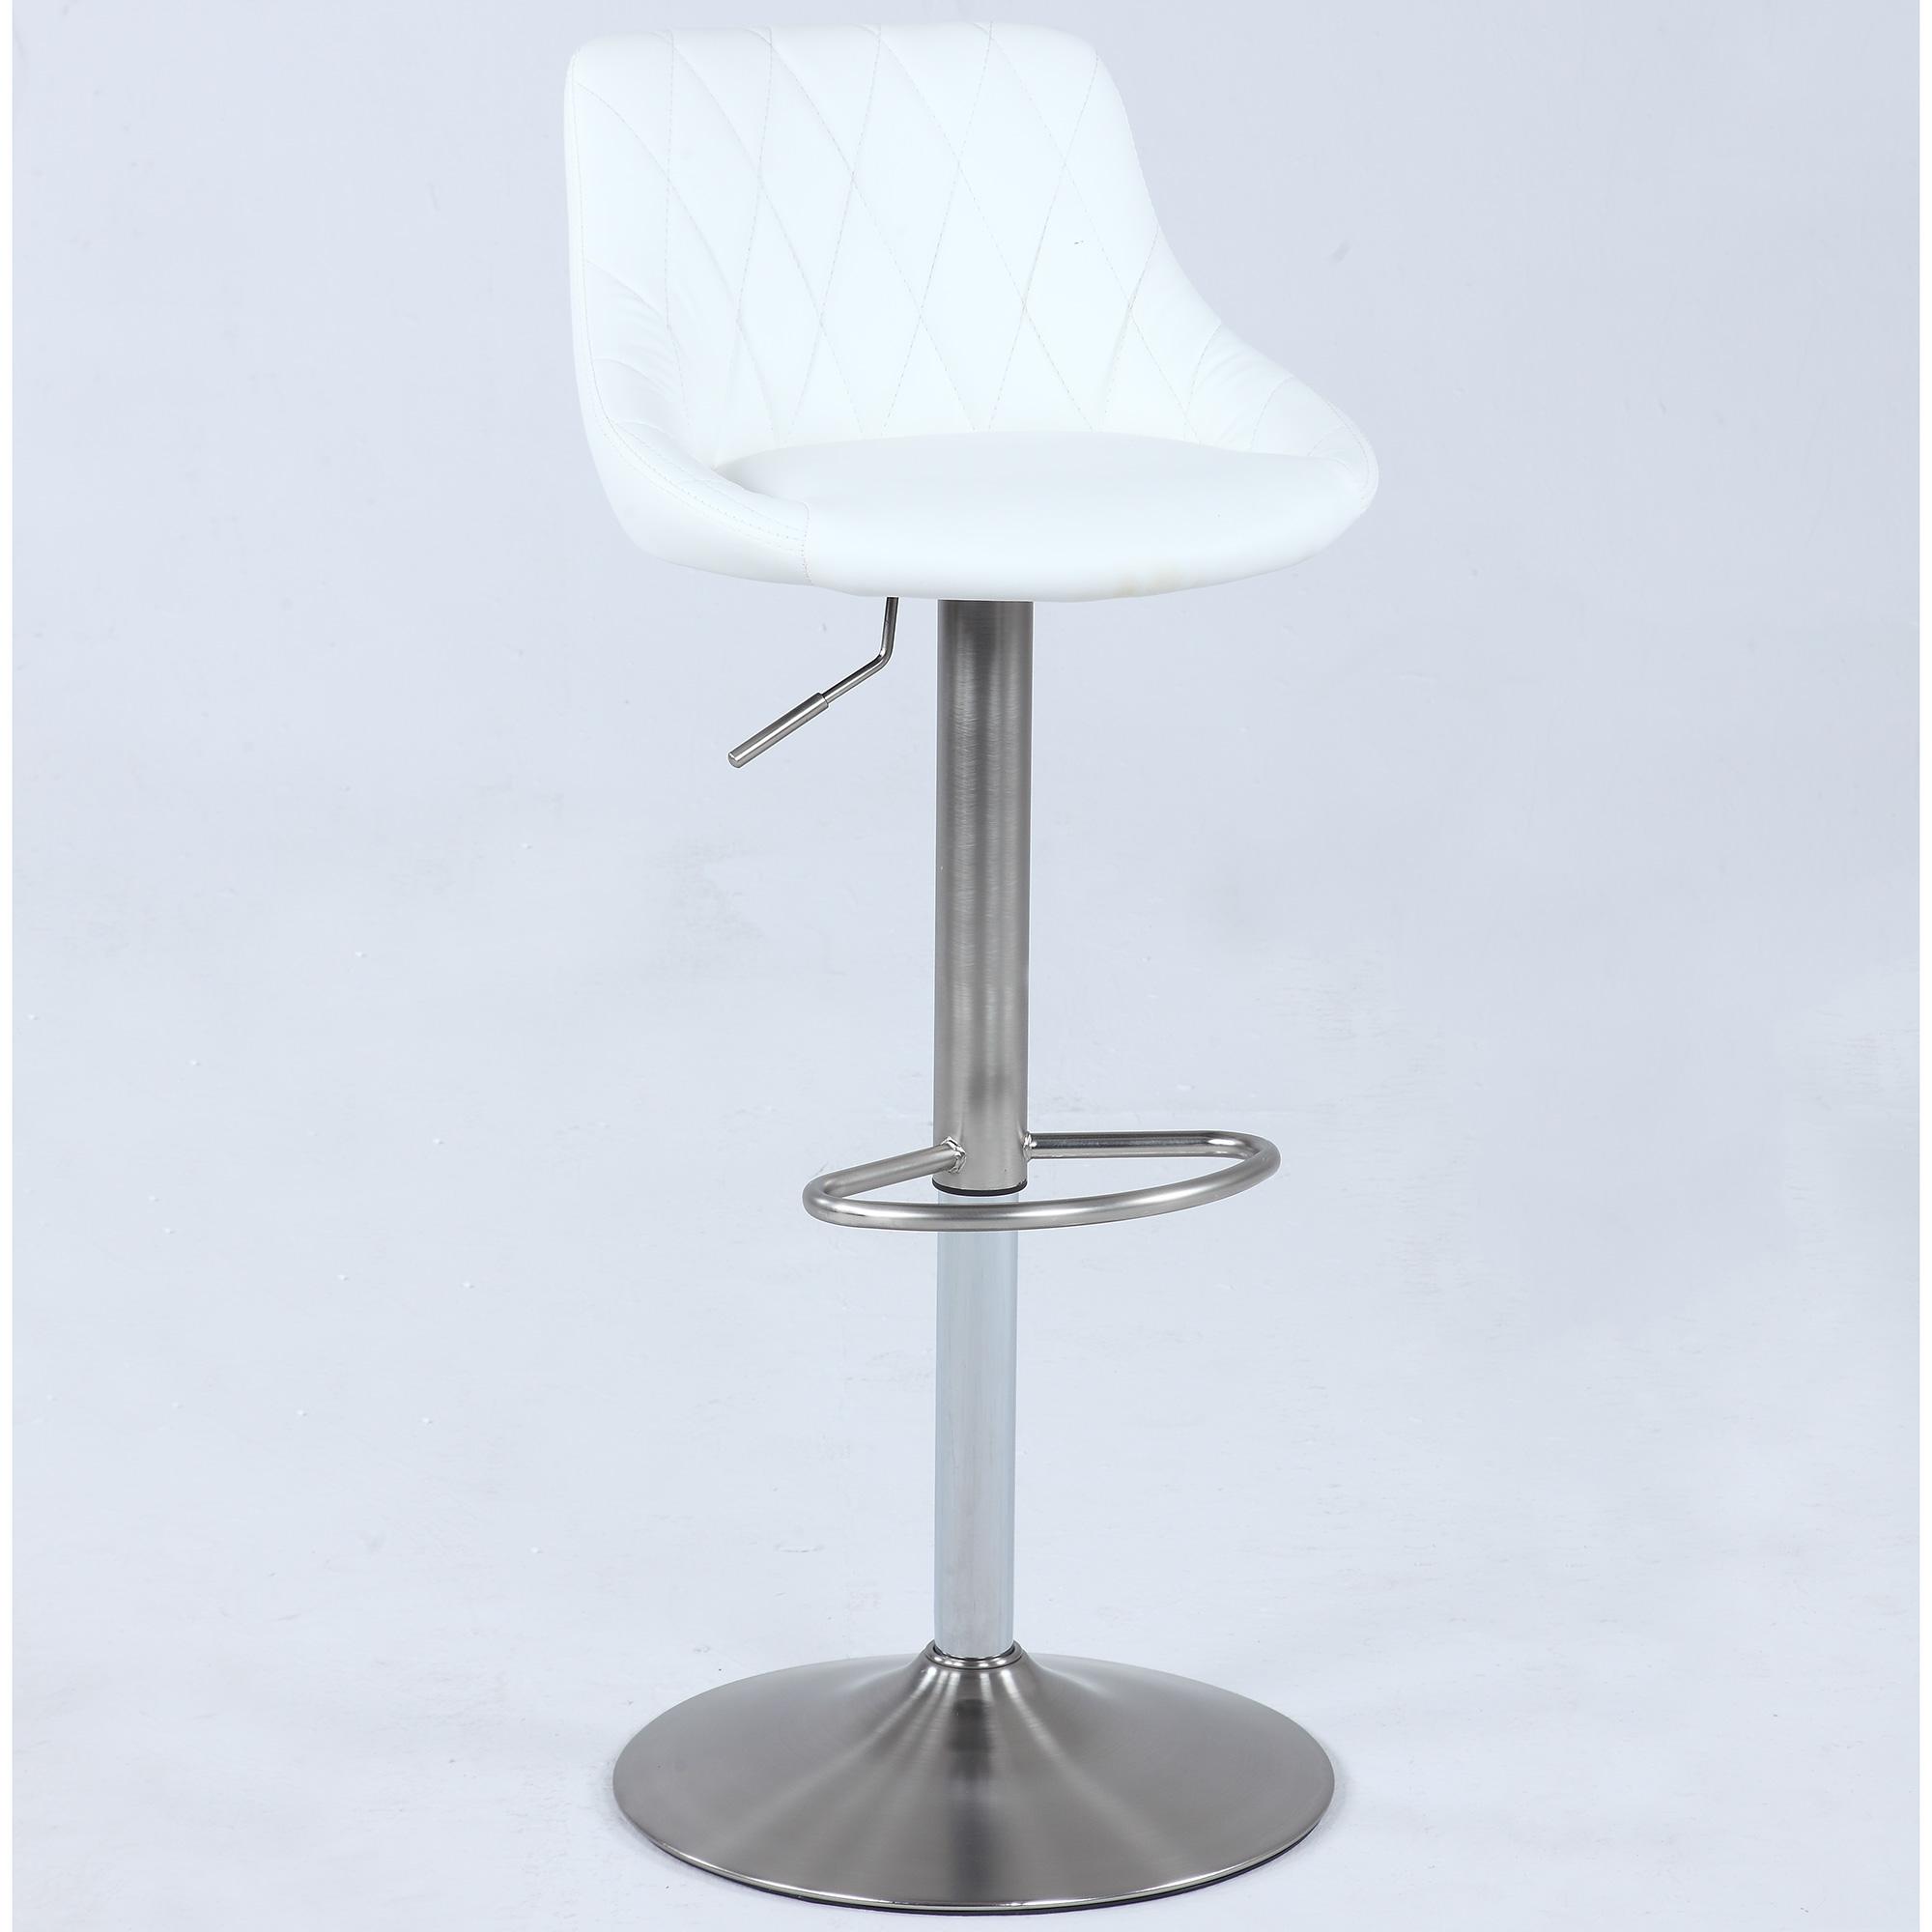 chintaly imports aswht pneumatic swivel stool in white  - pneumatic swivel stool in white leather w diamond stitching on brushednickel